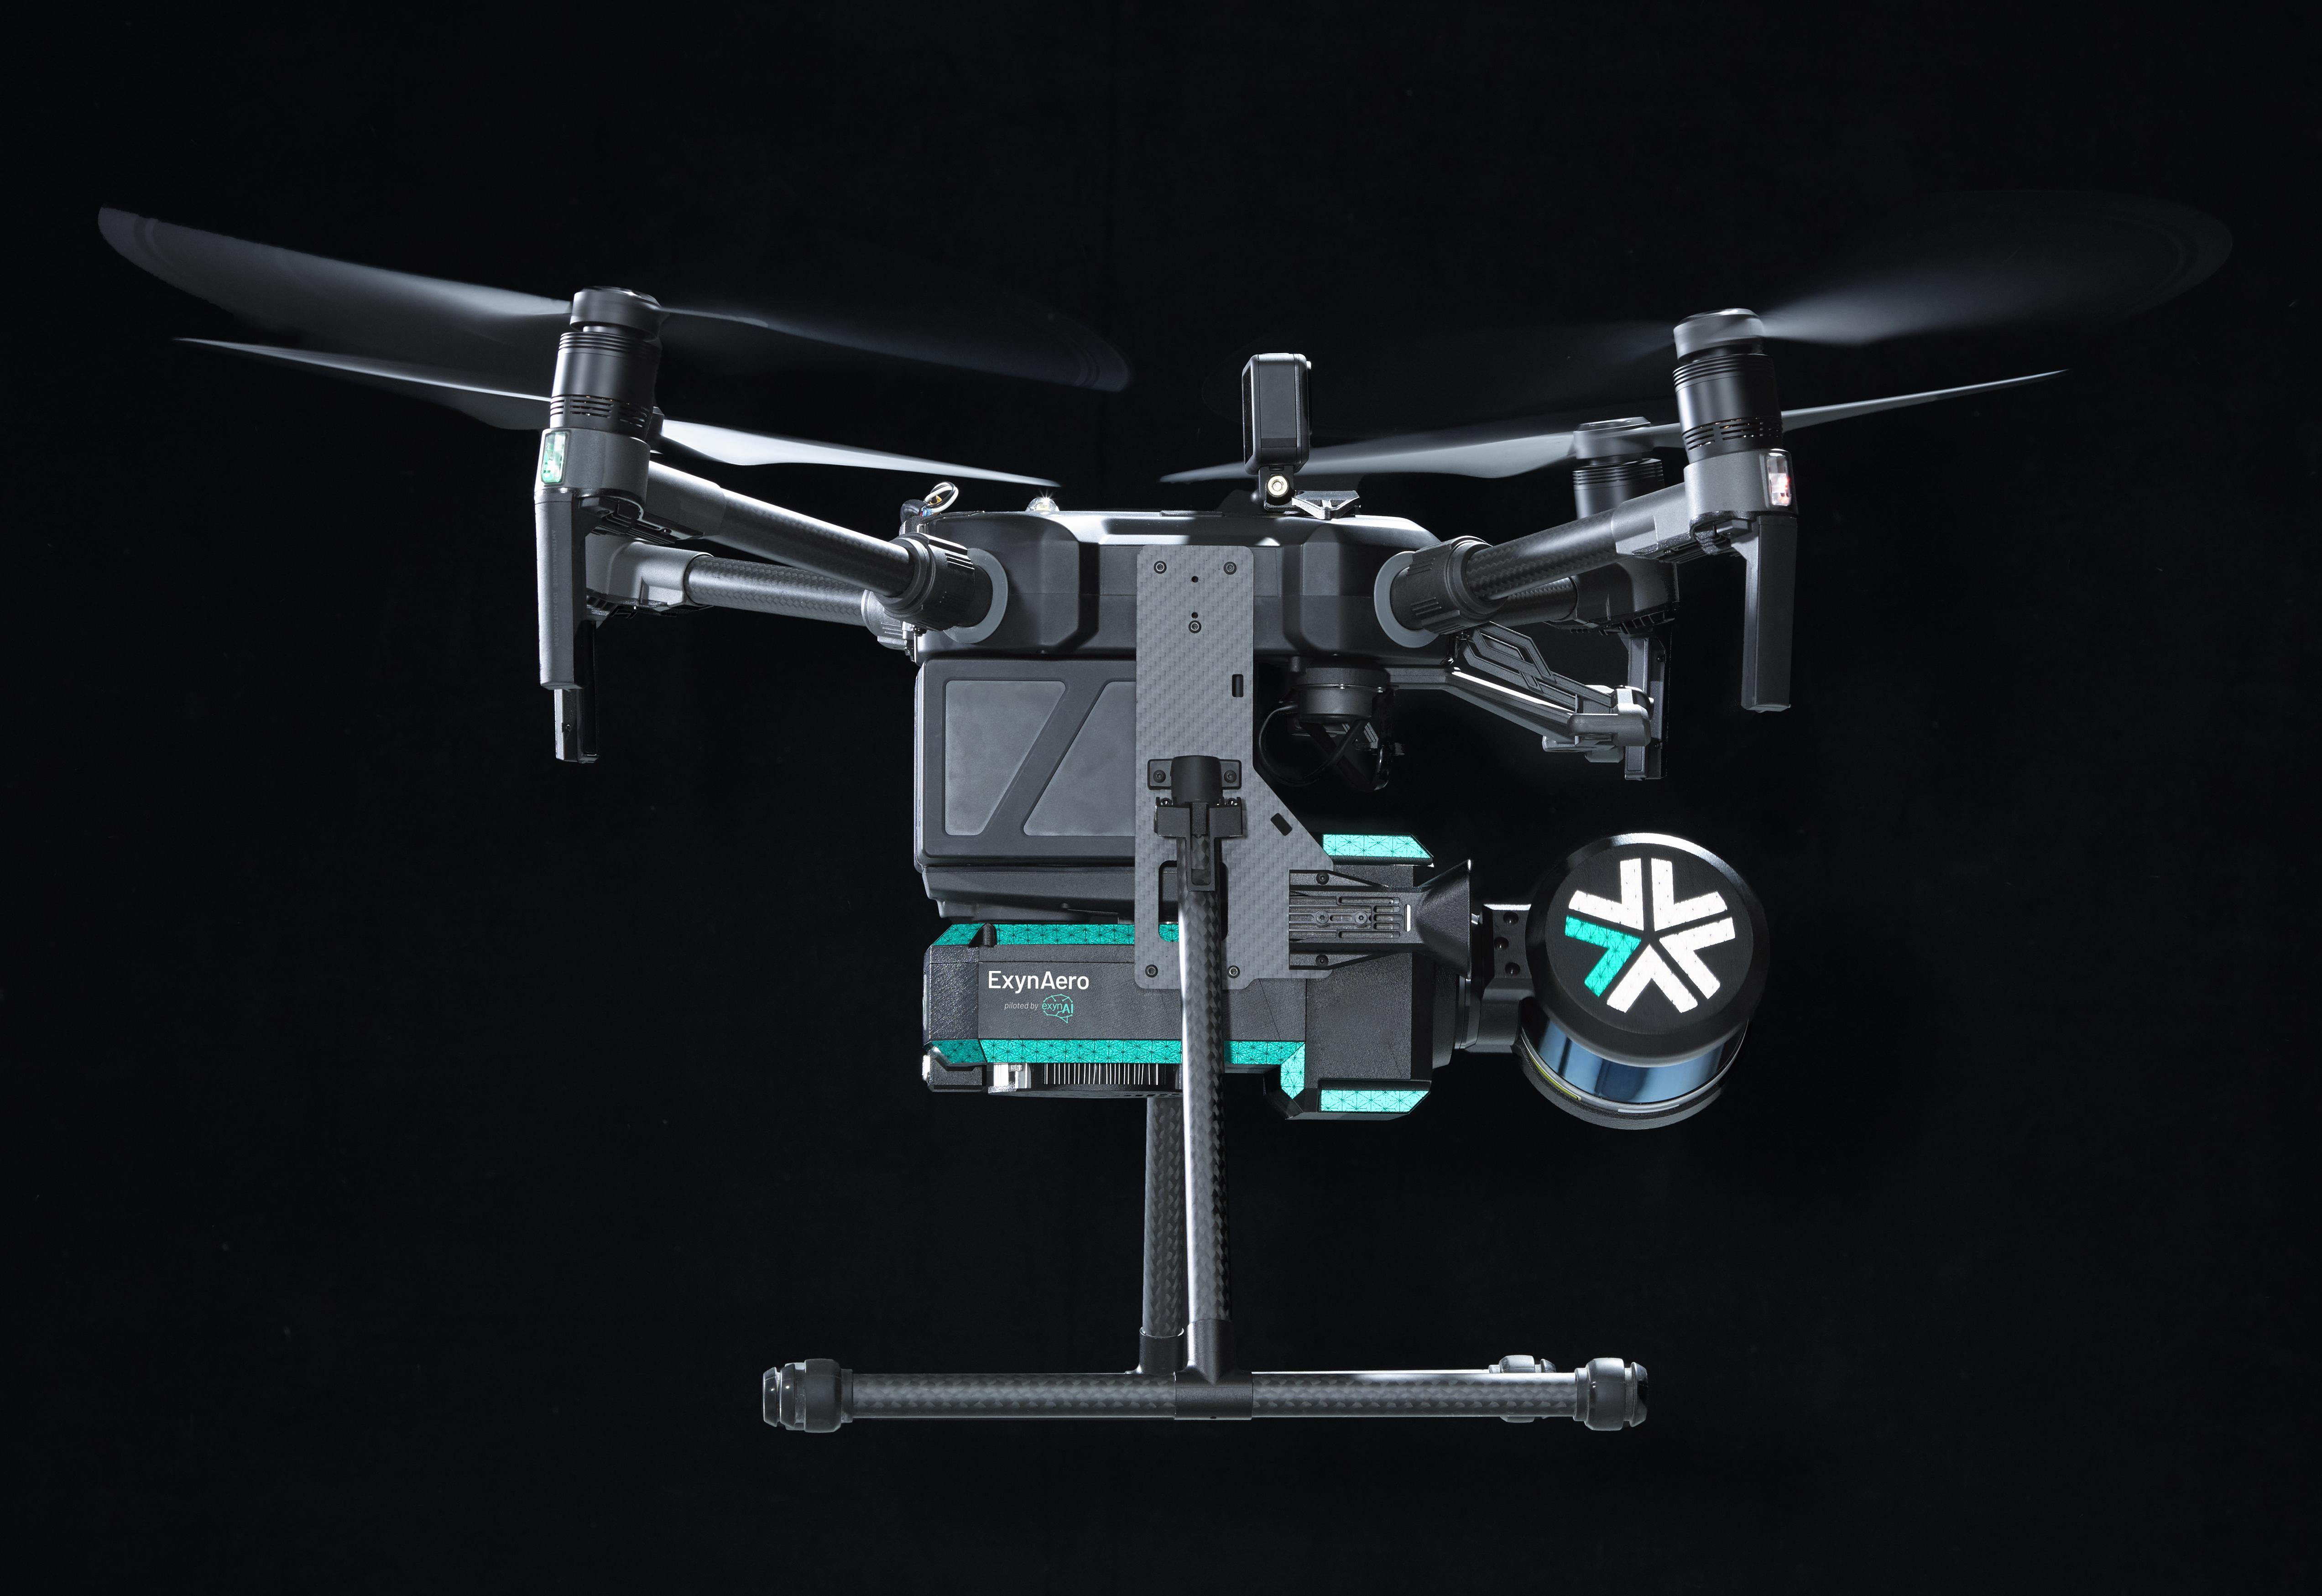 Exyn Drone flies in a mine